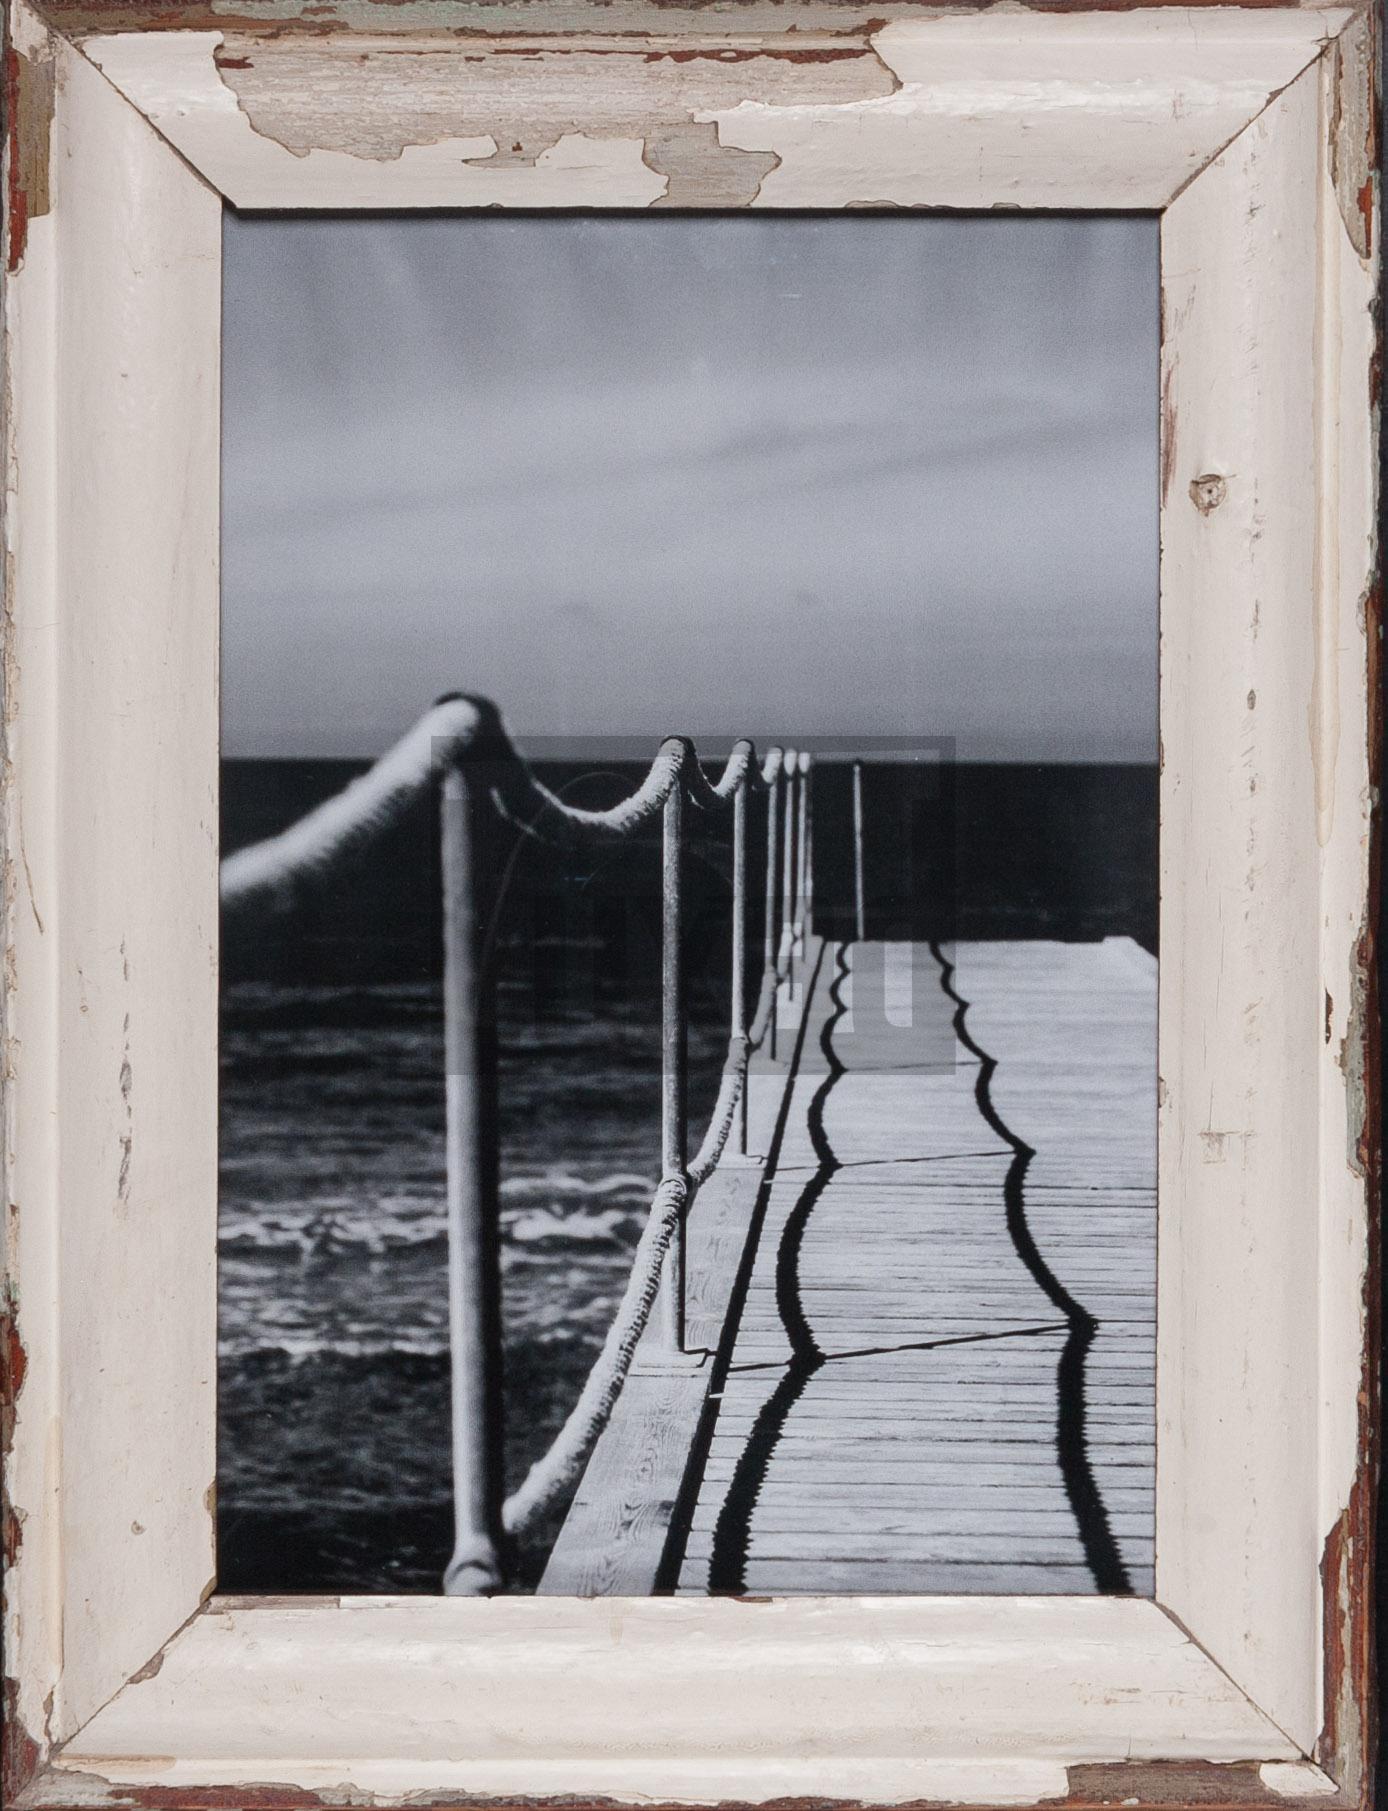 Vintage-Bilderrahmen aus altem Holz für Fotos ca. 29,7 x 42 cm